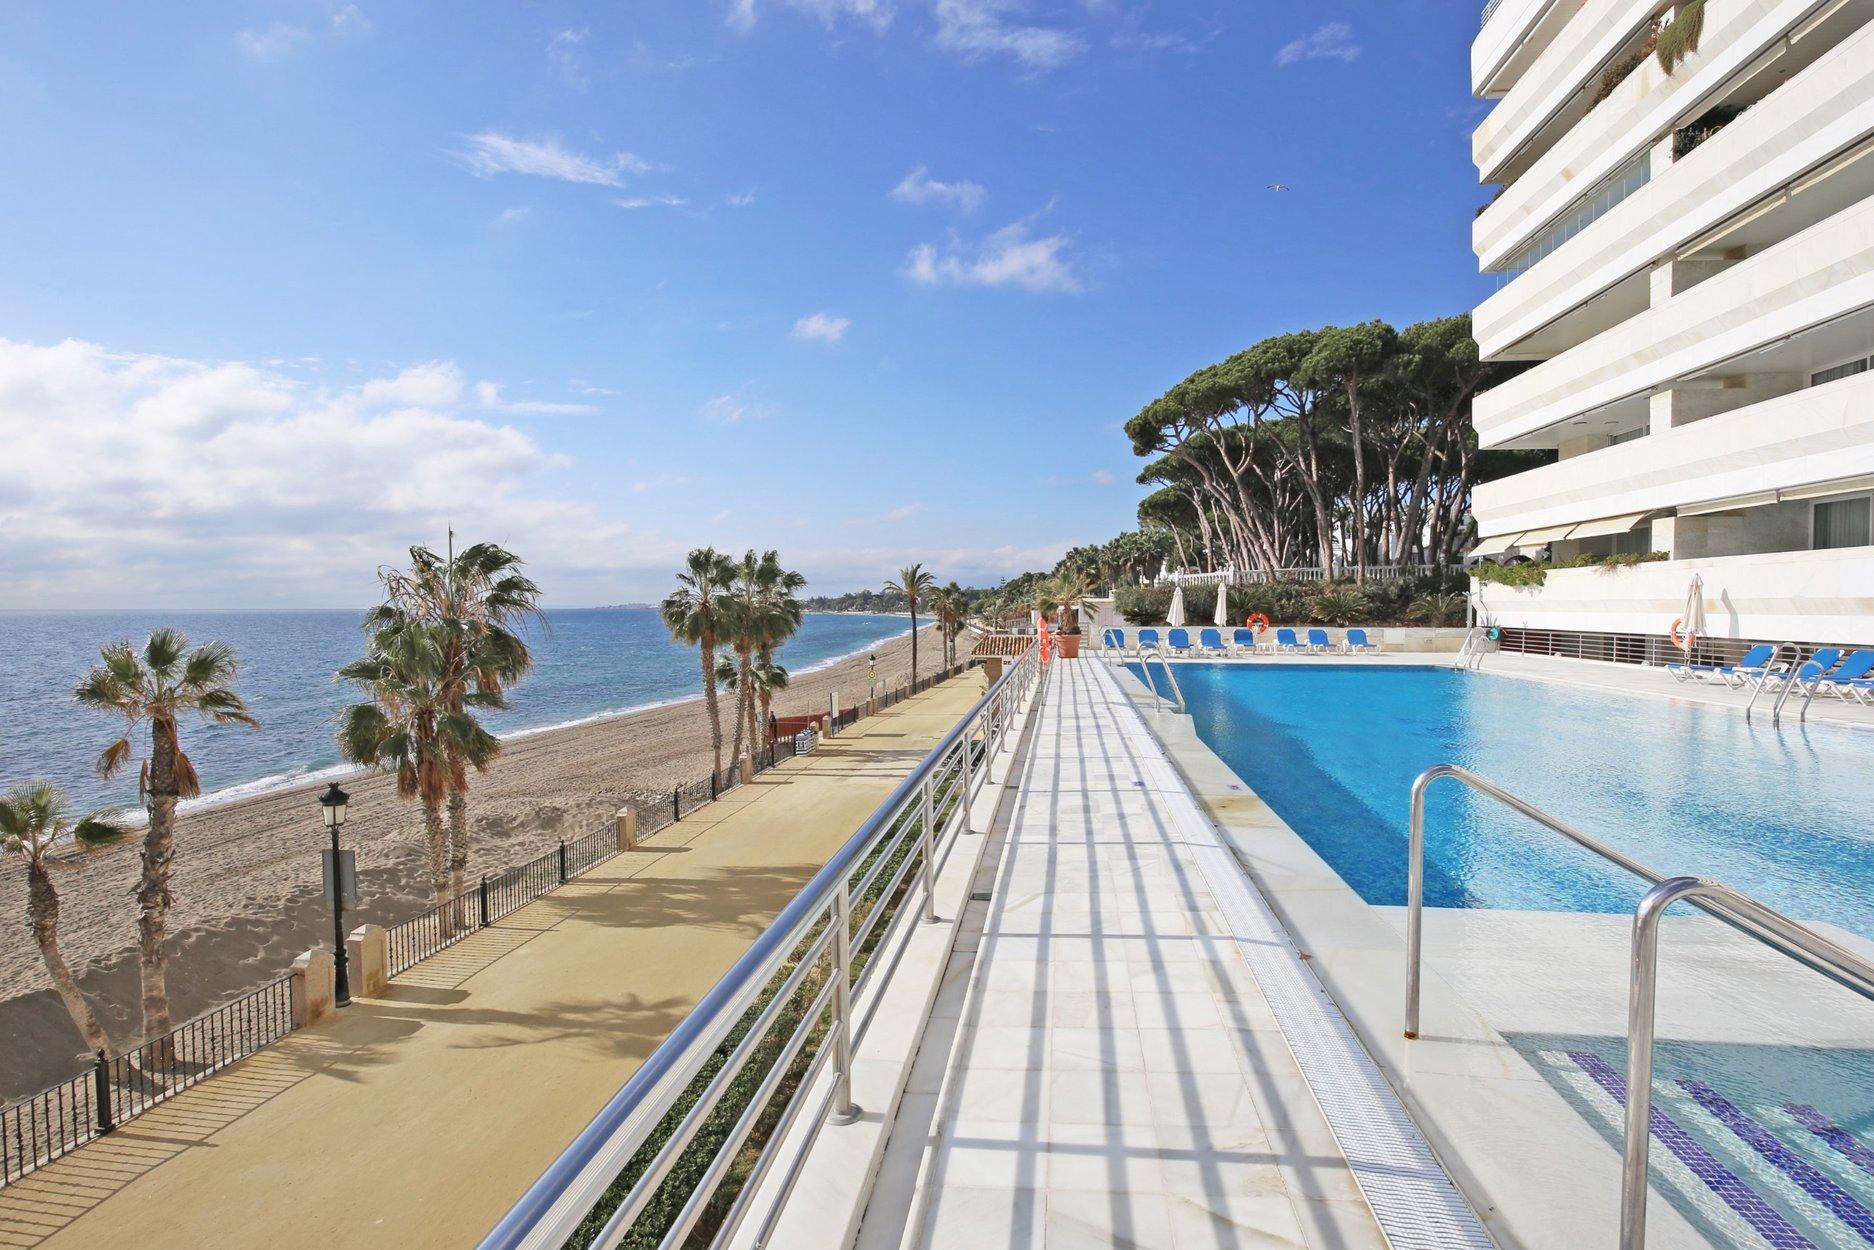 Apartment for sale in Marbella, Marina Mariola